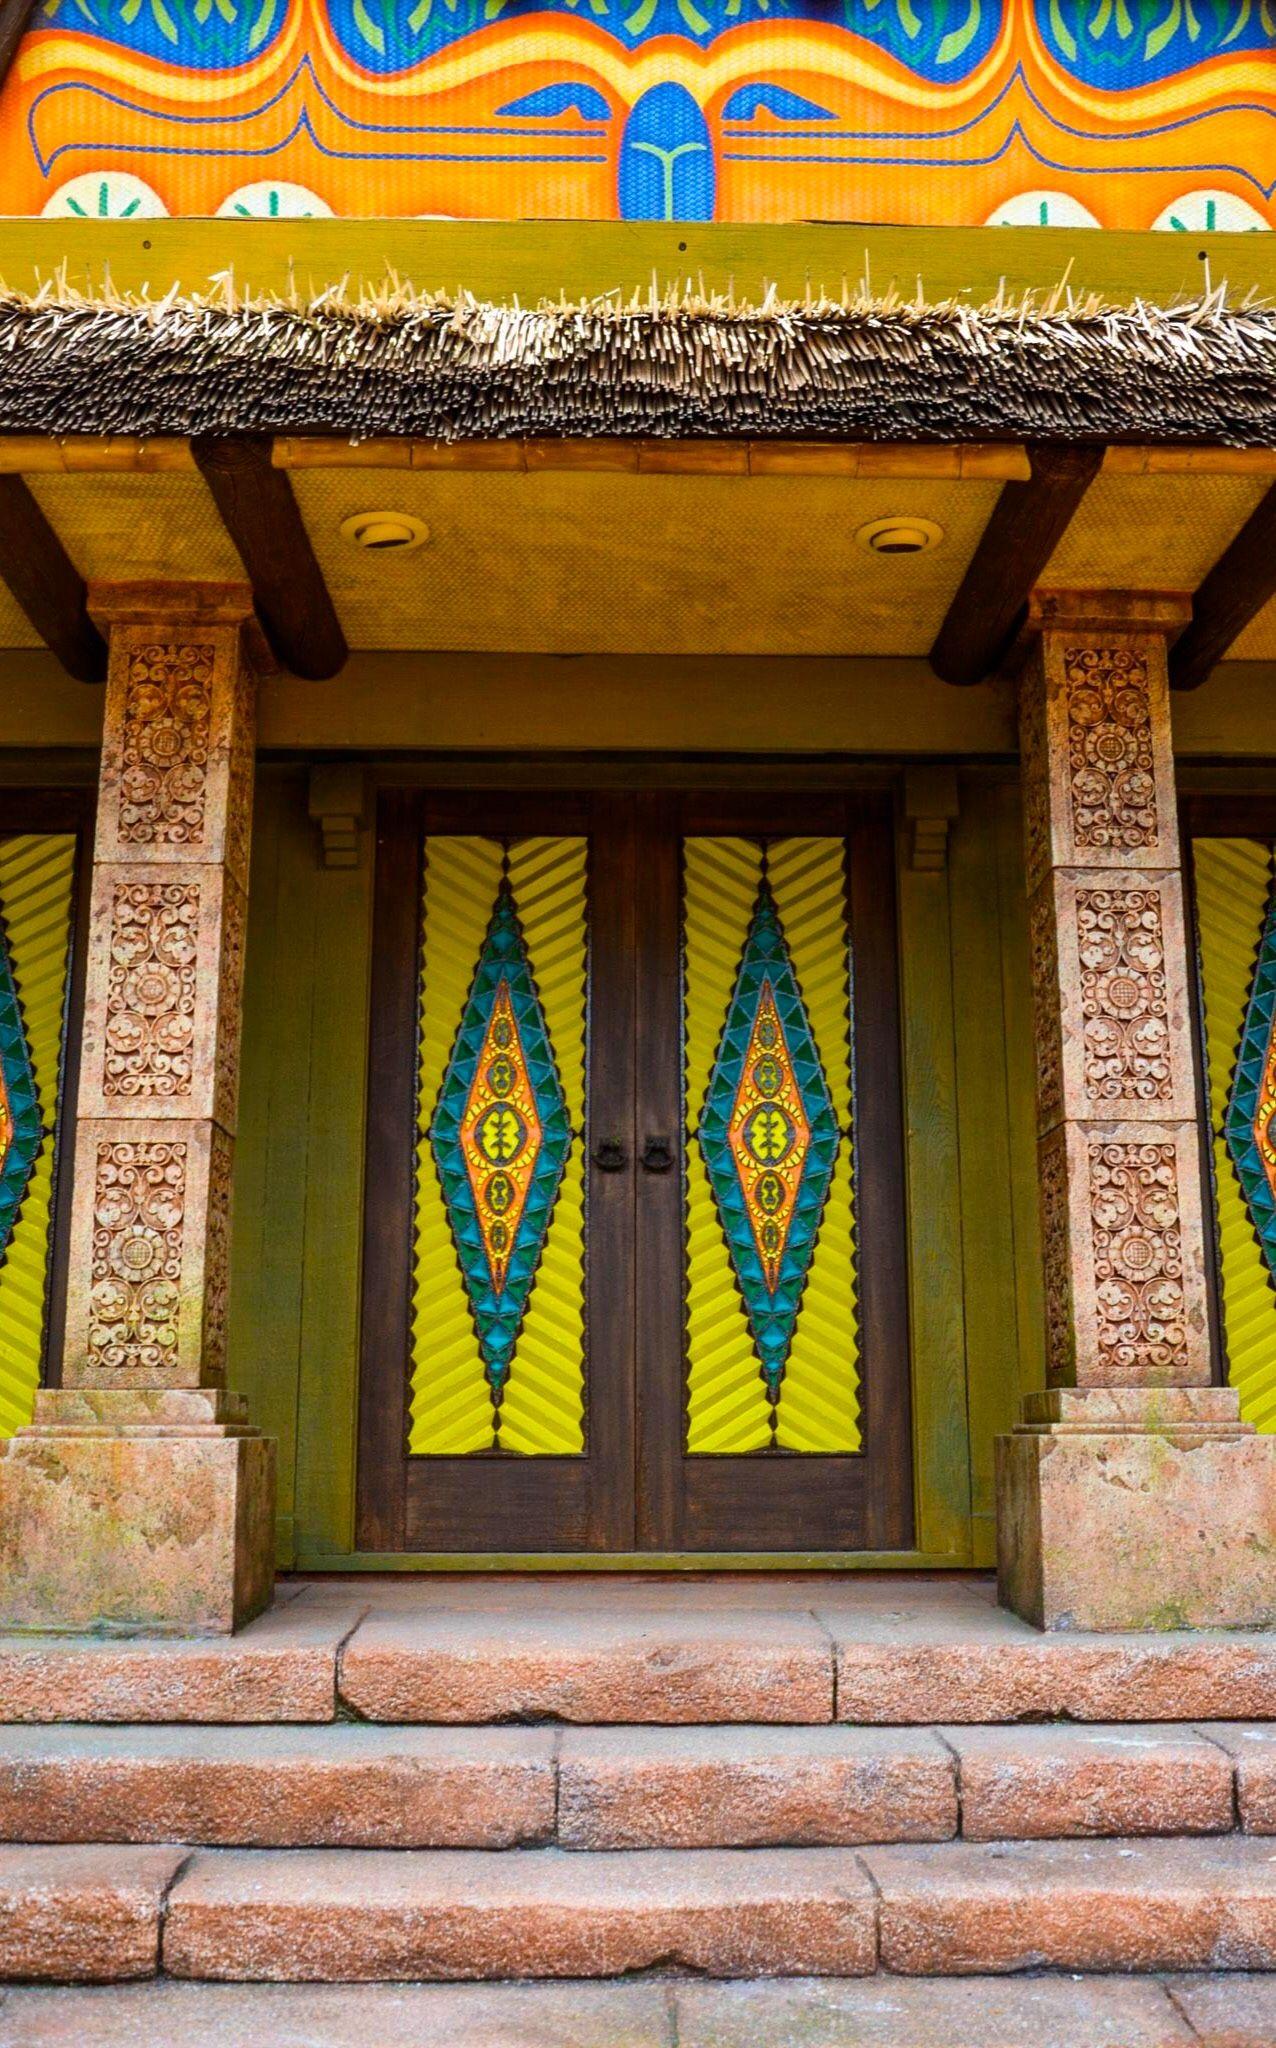 Tribal Doors by chriswtaylor travel old tourism architecture culture steps africa doors tribe traditional ethiopia tribal Florida & Magic Kingdom Walt Disney World - Orlando Florida ..rh | Doors n ...